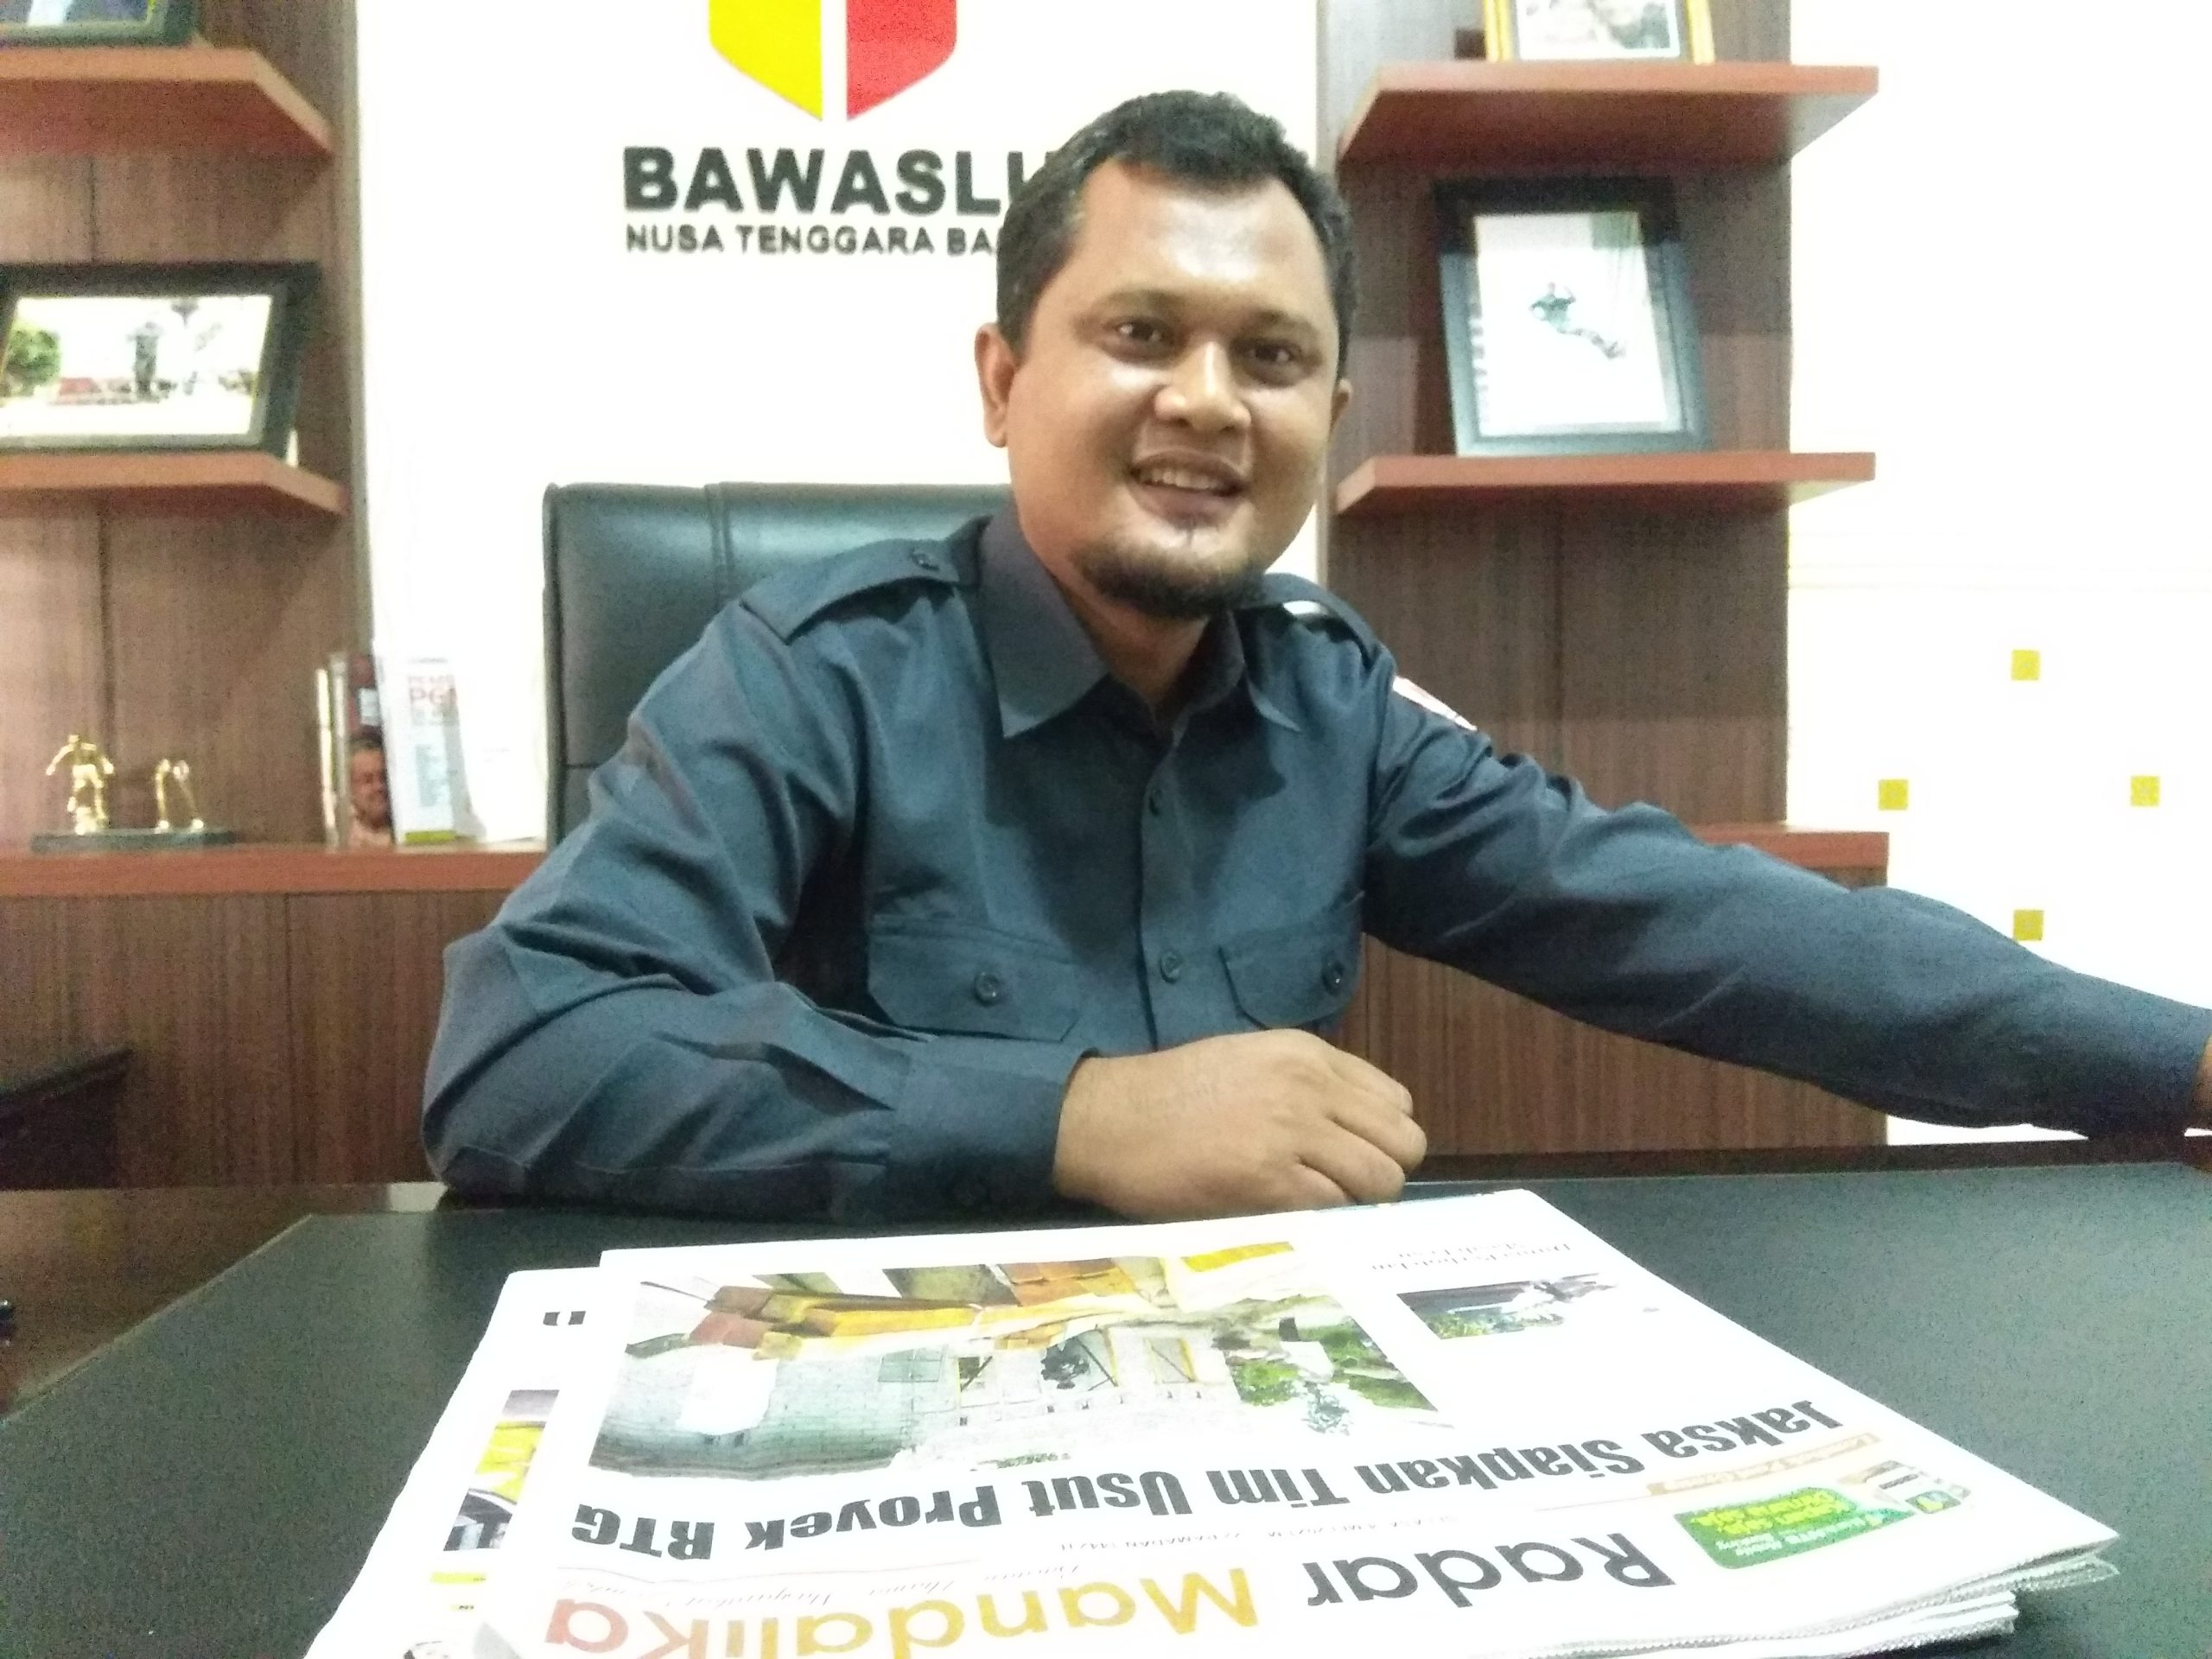 F Bawaslu NTB scaled